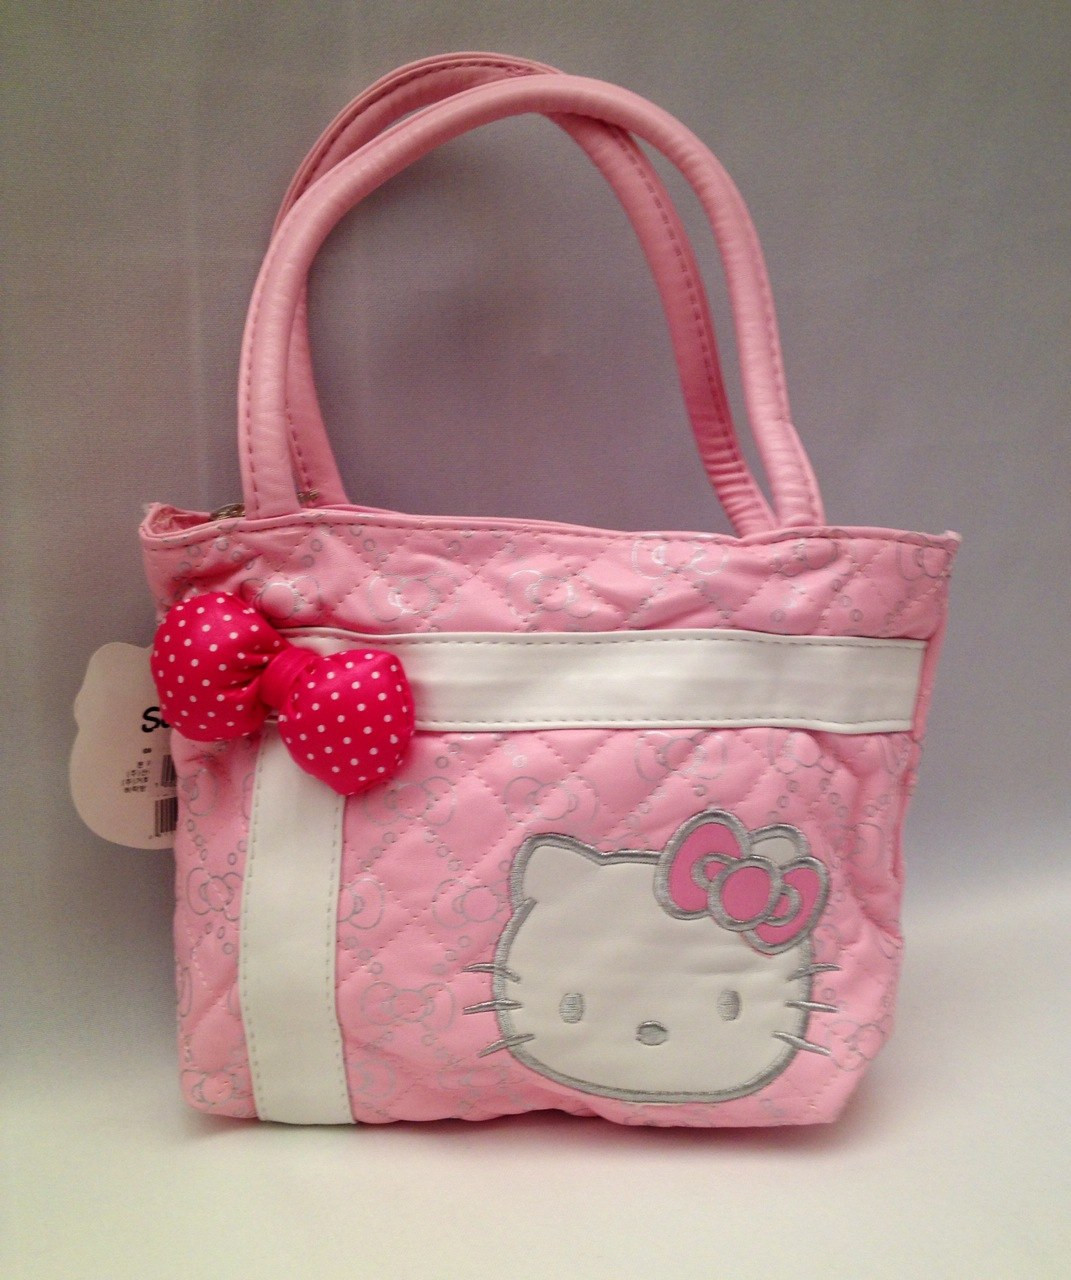 Сумка с бантиком Hello Kitty 2013-1